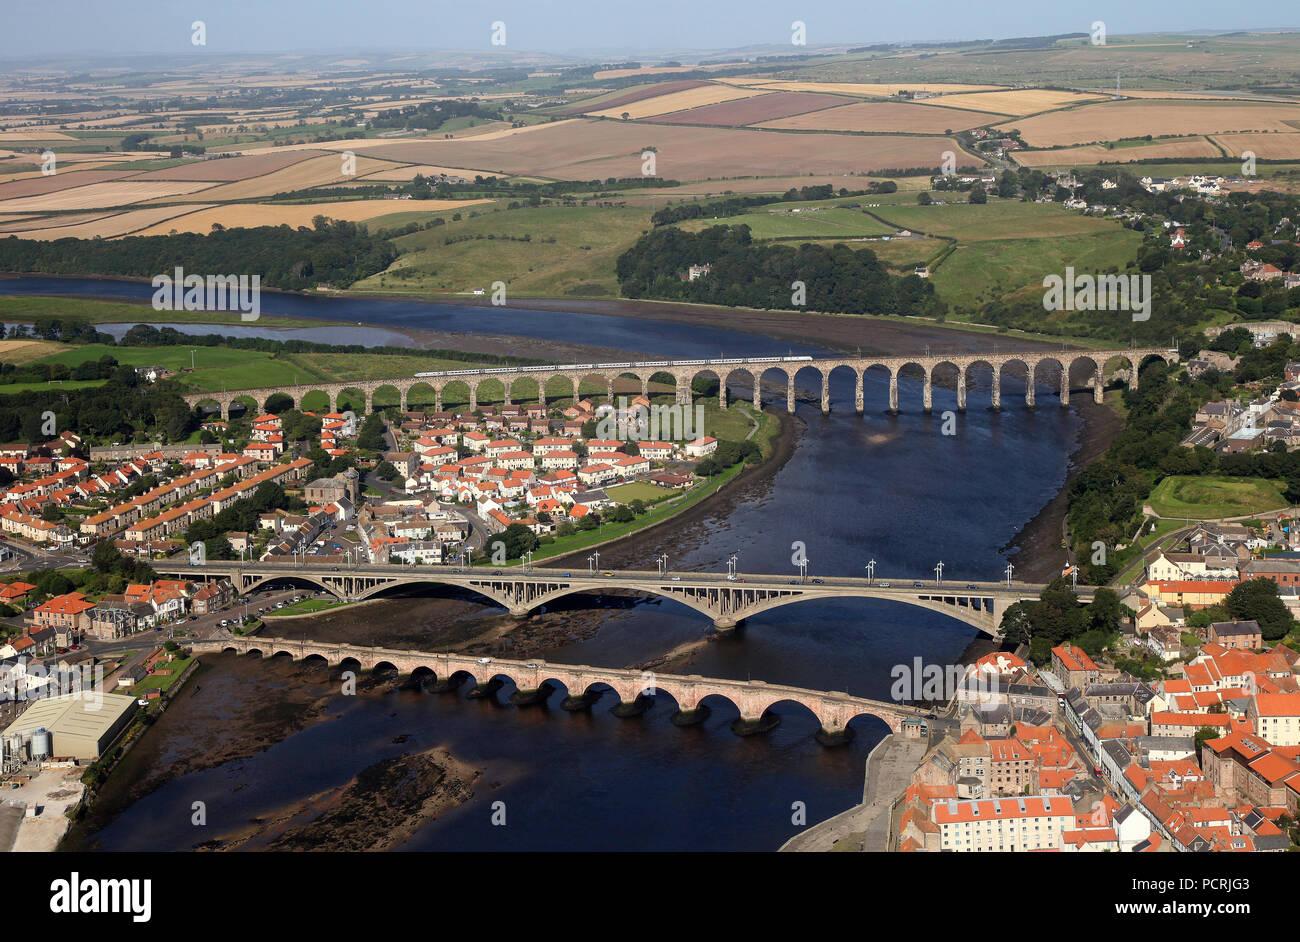 Royal Border Bridge at Berwick Upon Tweed from the air on 4.9.12 - Stock Image